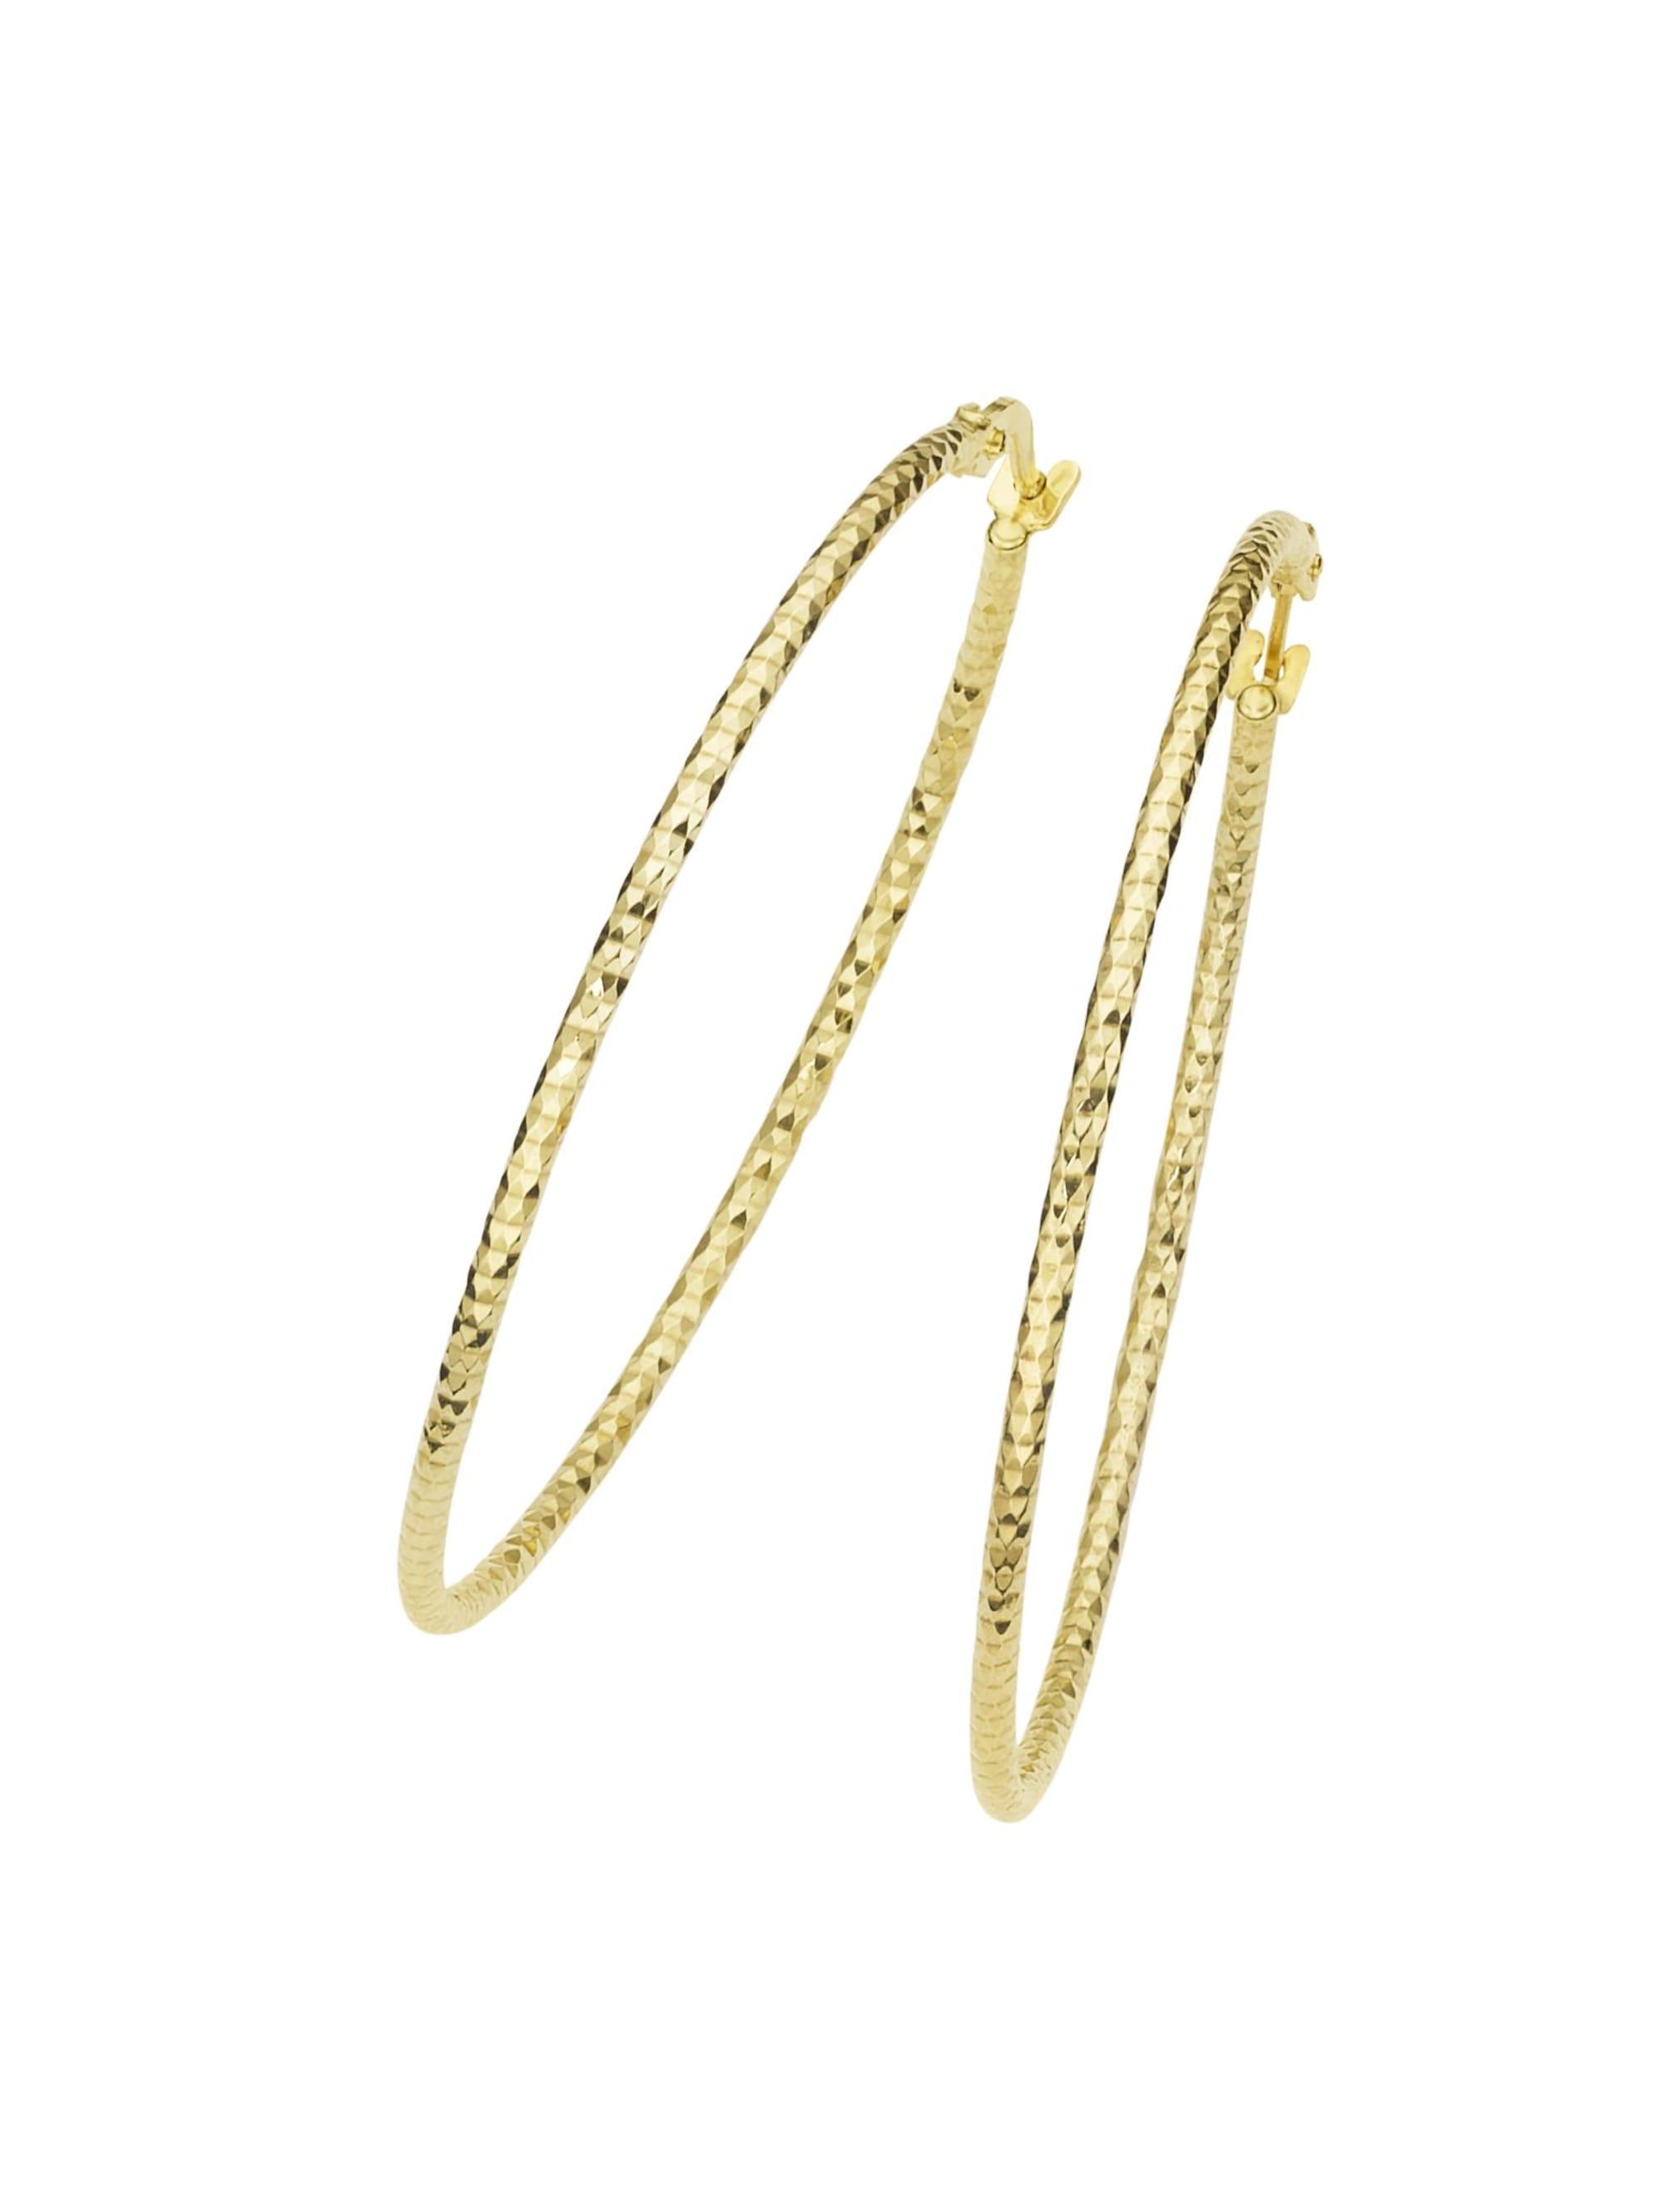 Luigi Merano Creolen mit diamantierter Oberfläche, Gold 375 c41ps